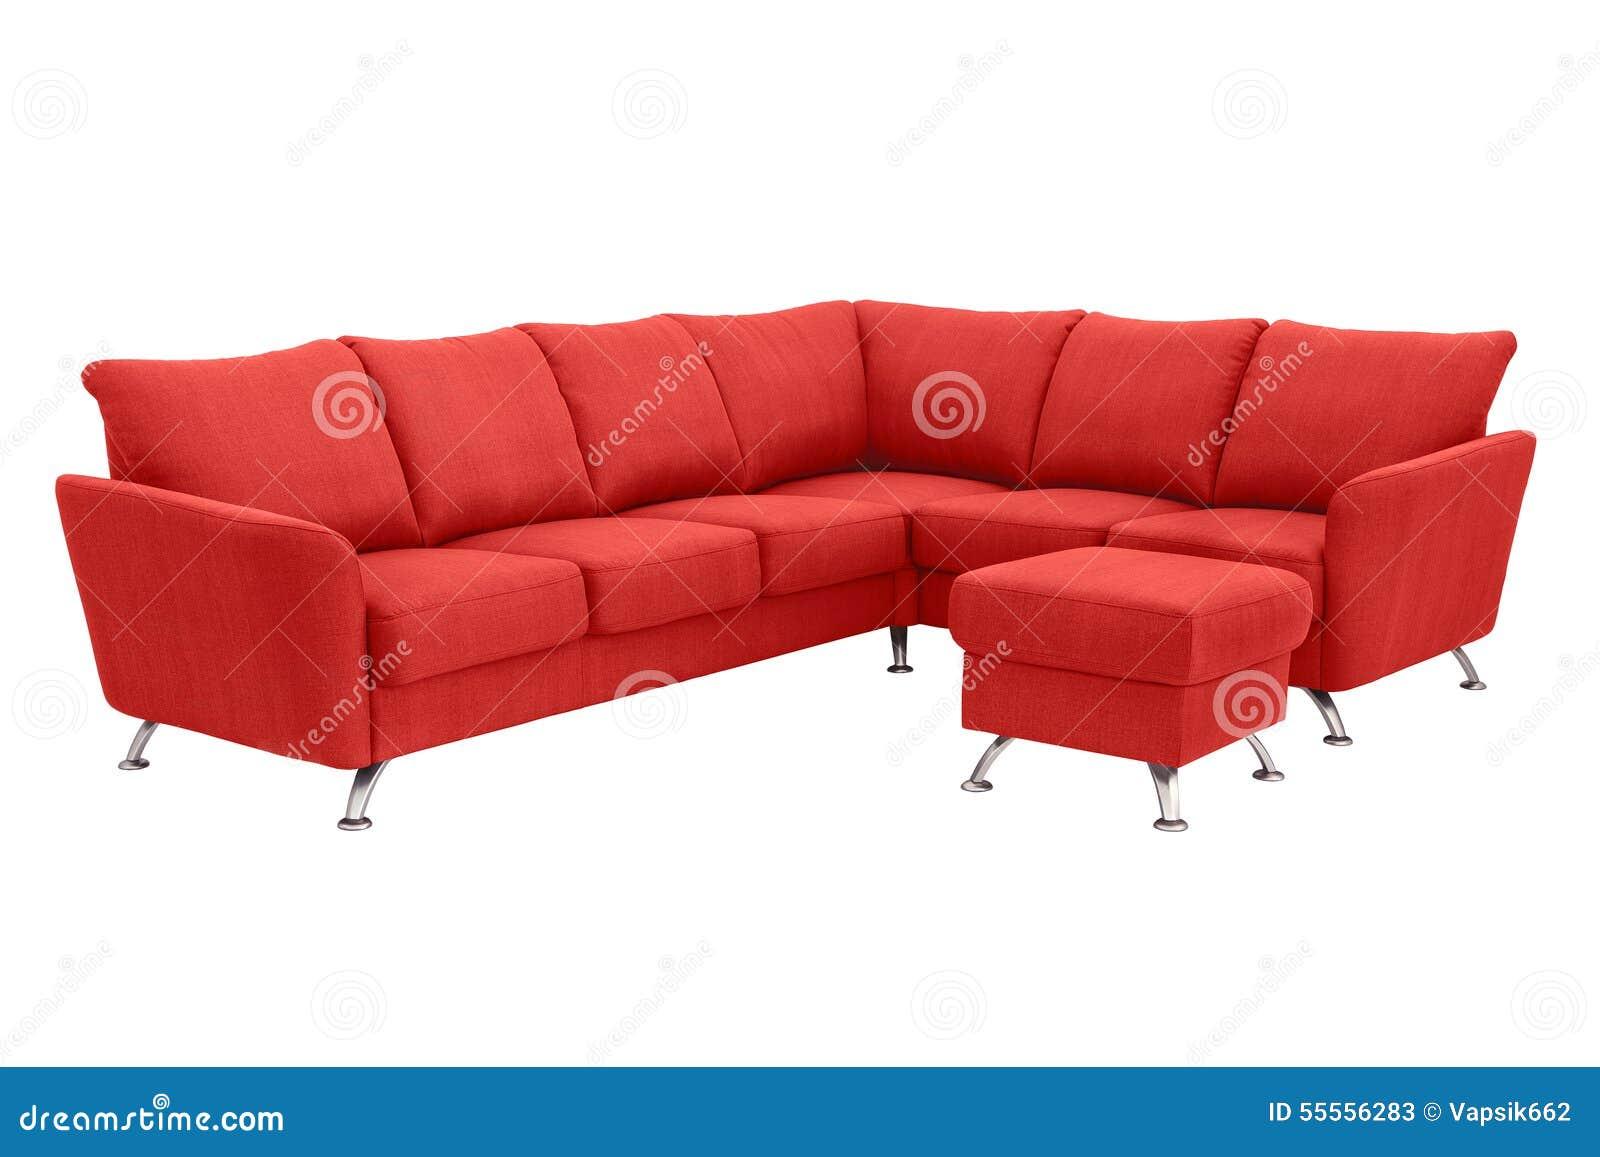 Red corner sofa. stock image. Image of style, legs, textile ...